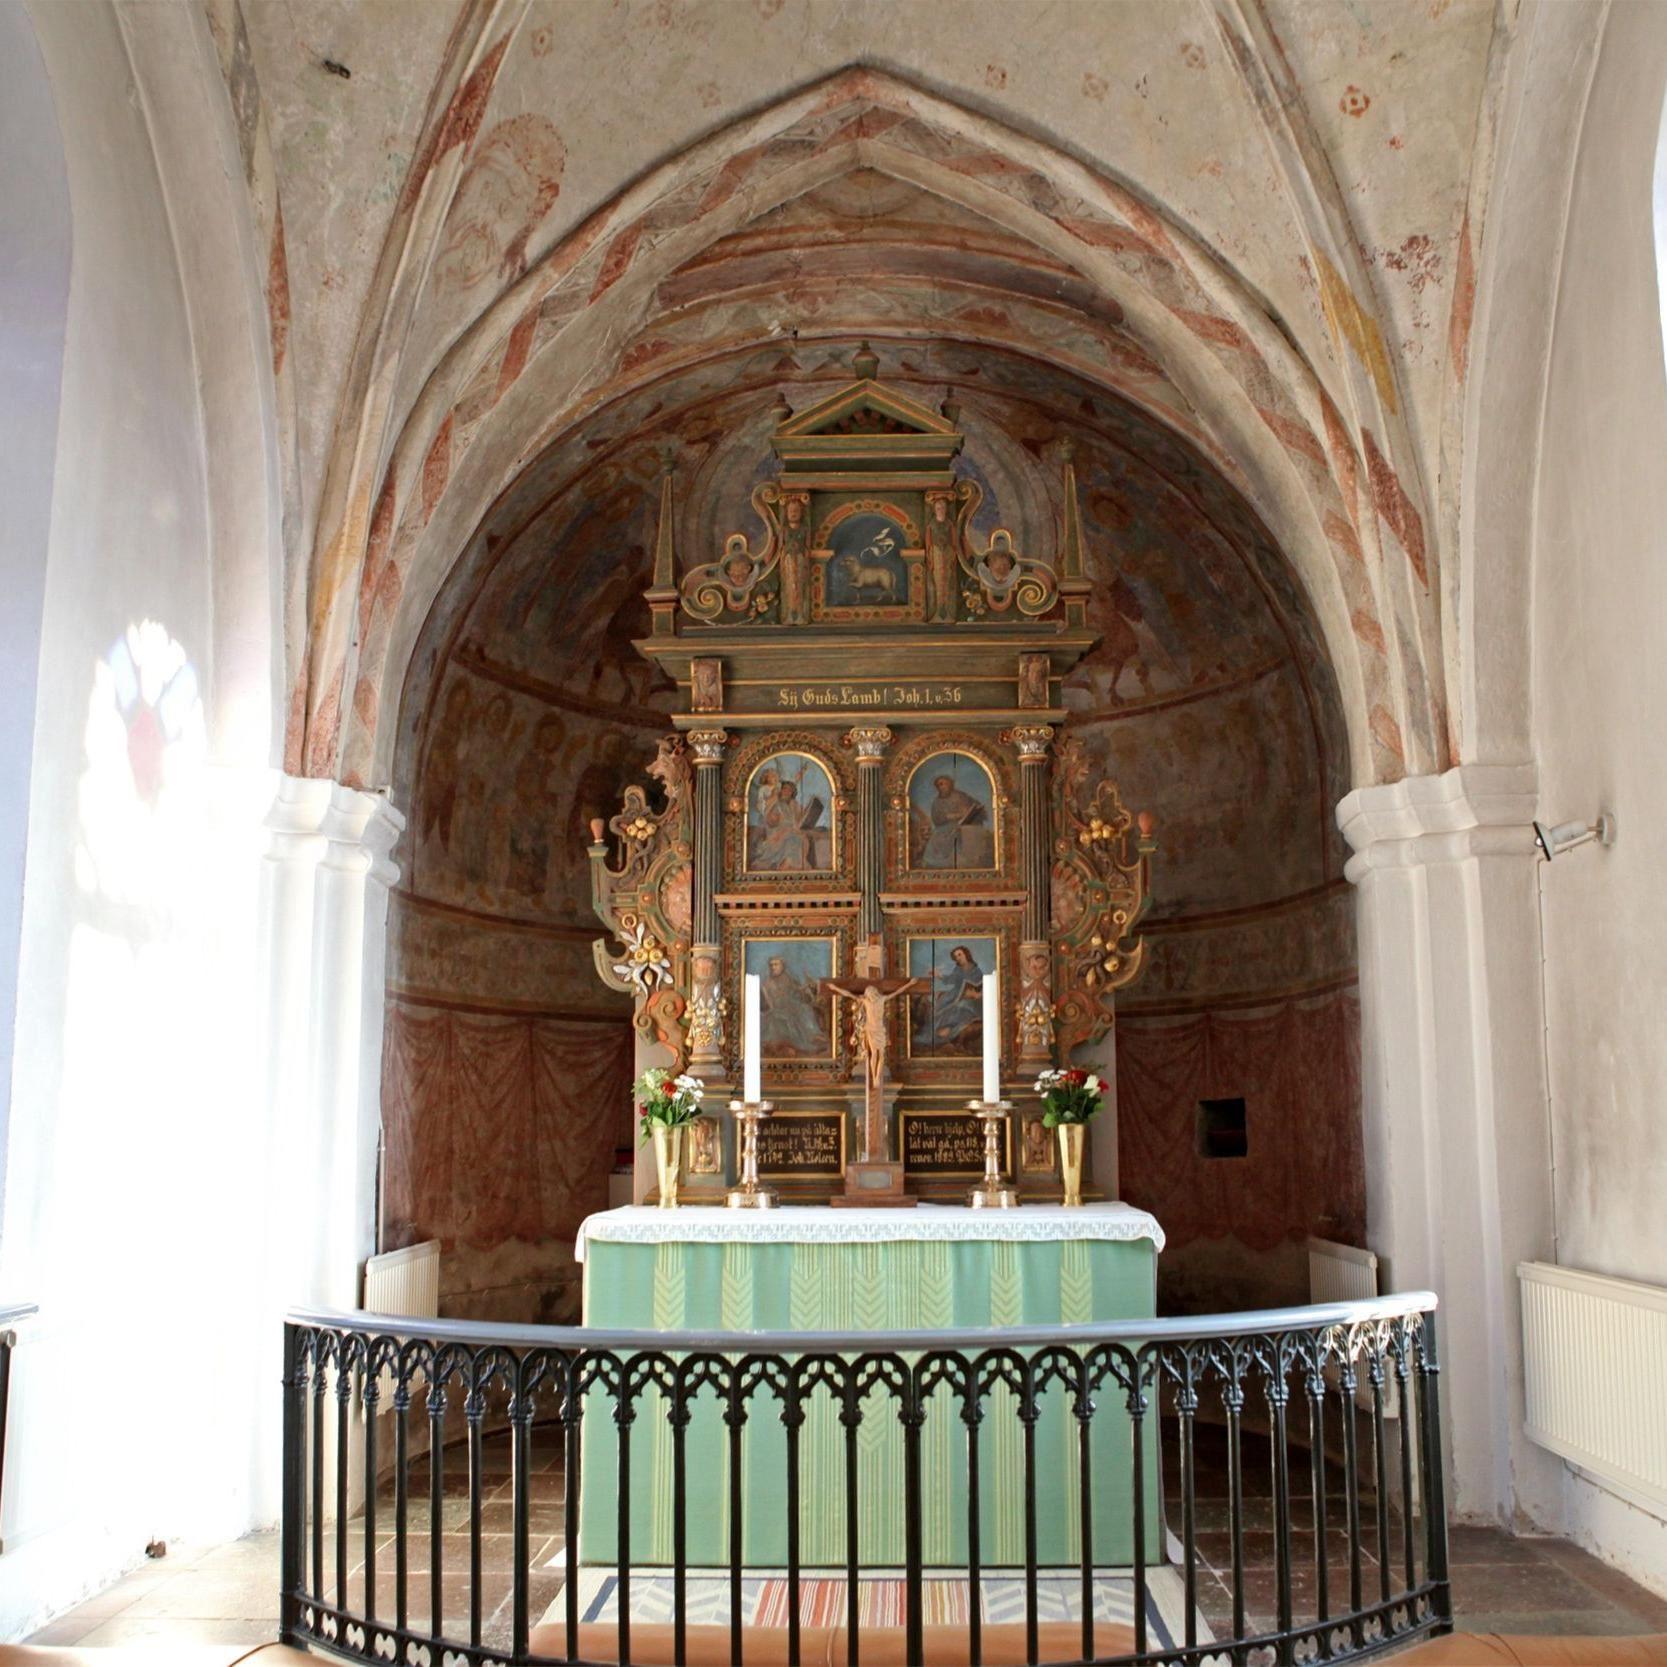 © Kävlinge kommun, Lackalänga church